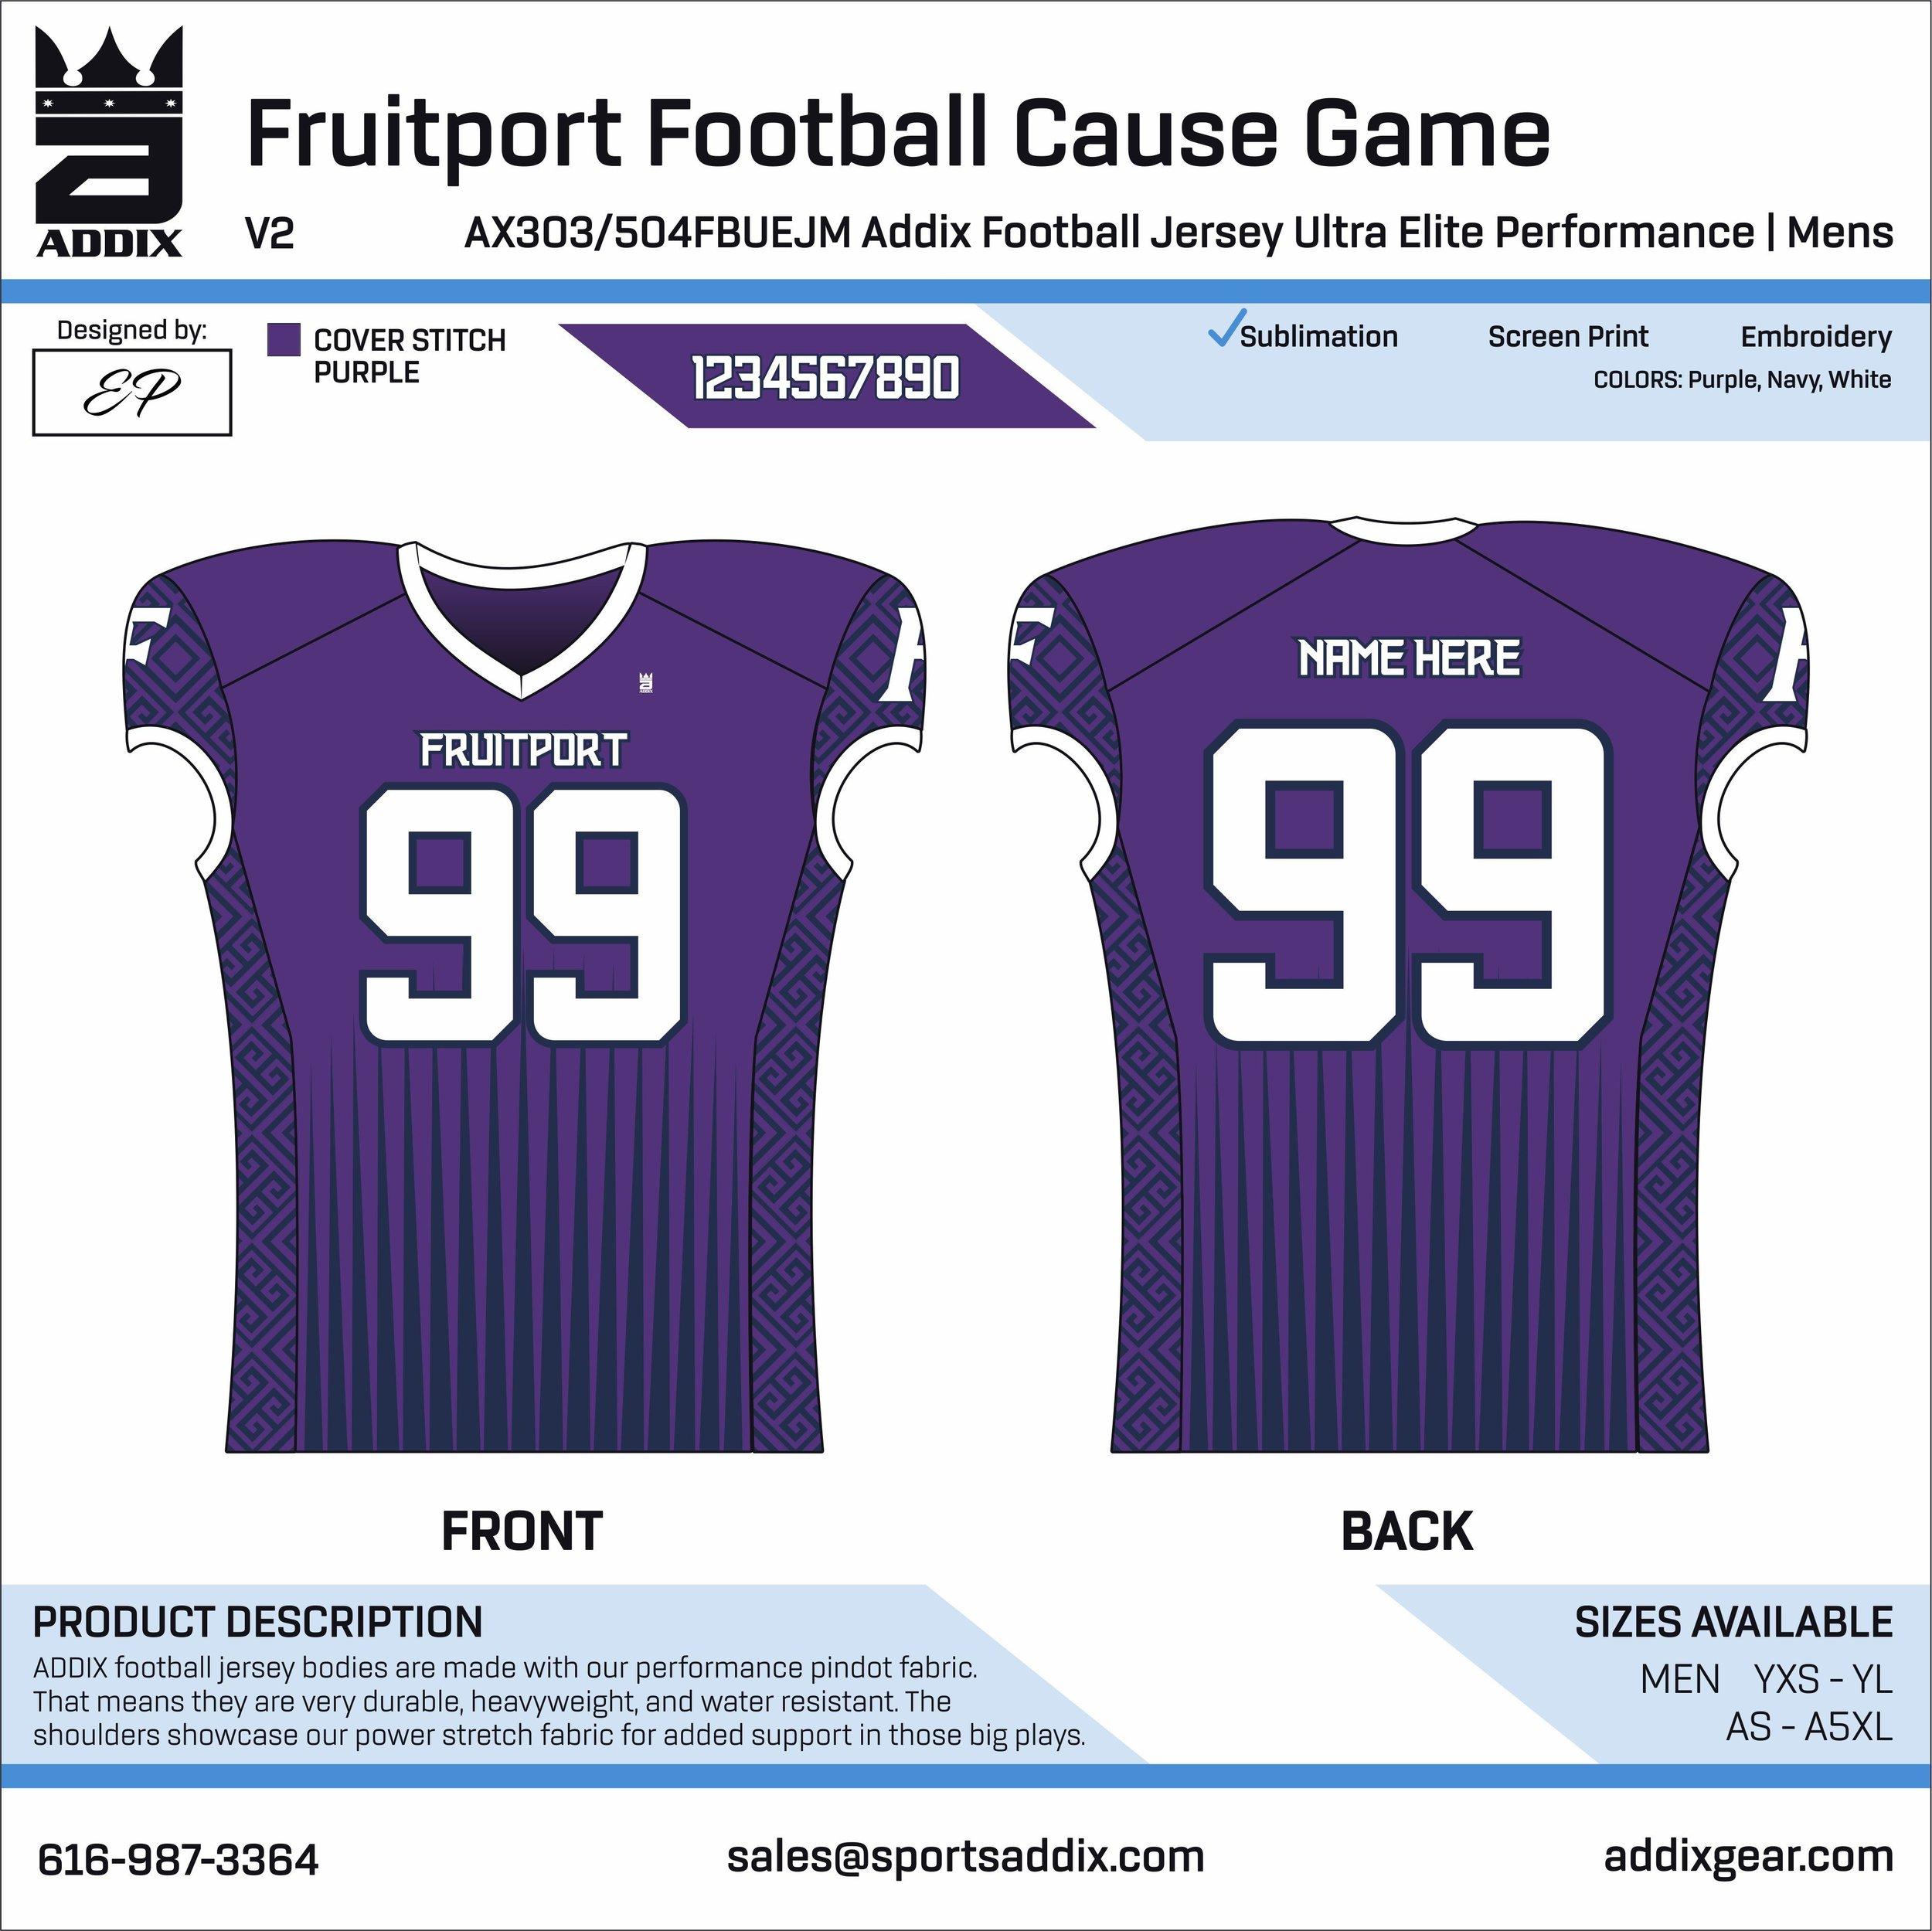 Fruitport Football Cause Game_2019_6-7_EP_UEP Jersey.jpg